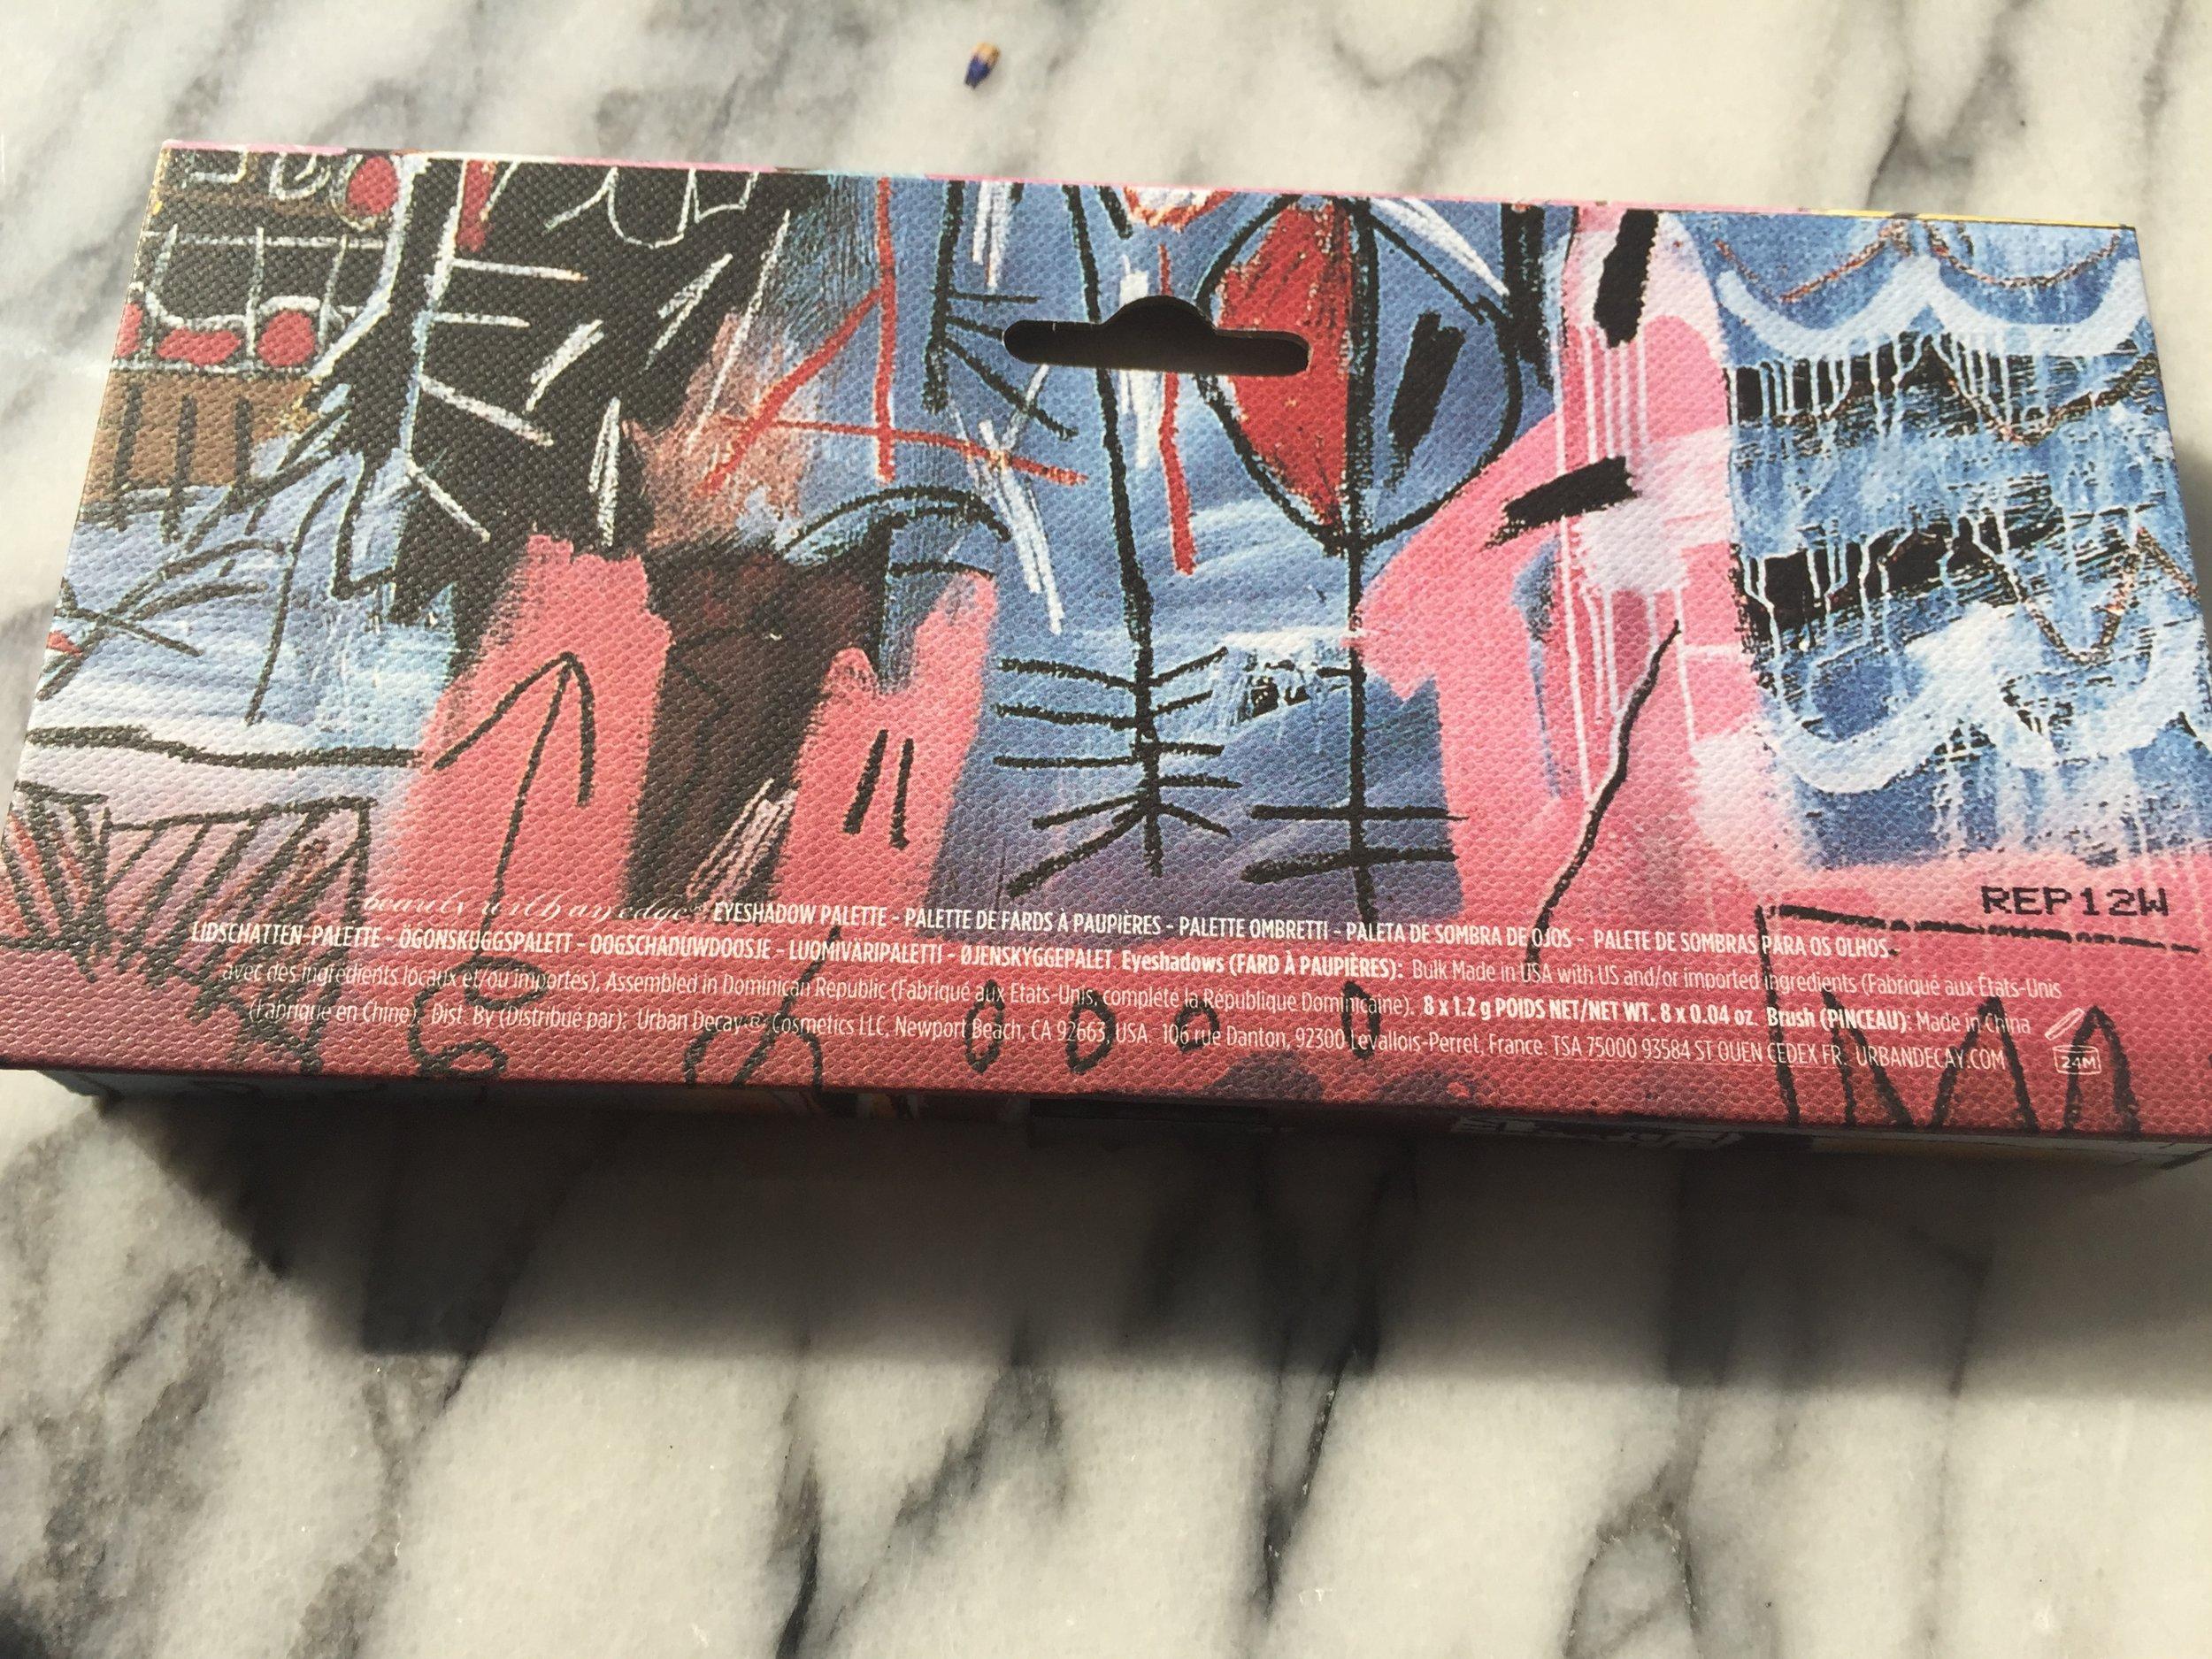 Urban Decay Basquiat Tenant Palette